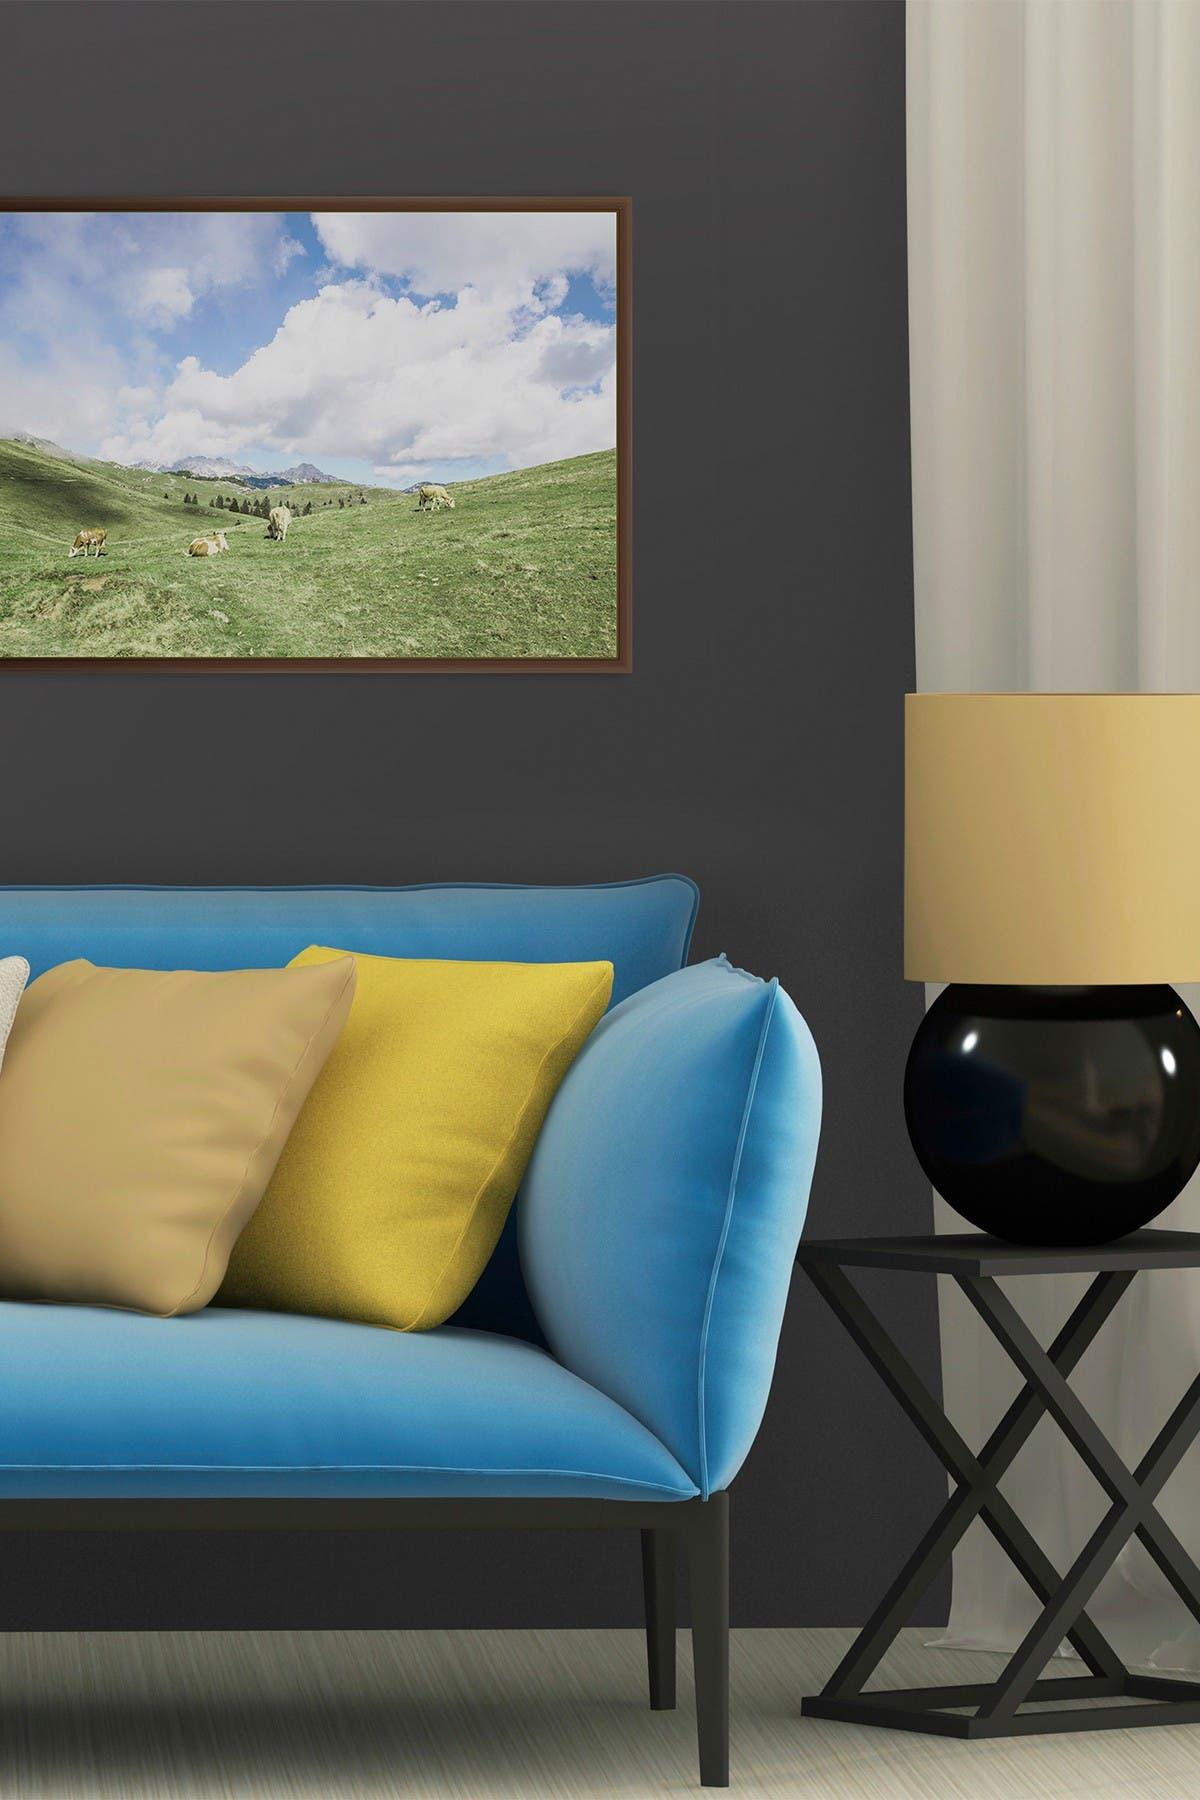 Image of PTM Images Medium Grass Landscape Canvas Wall Art